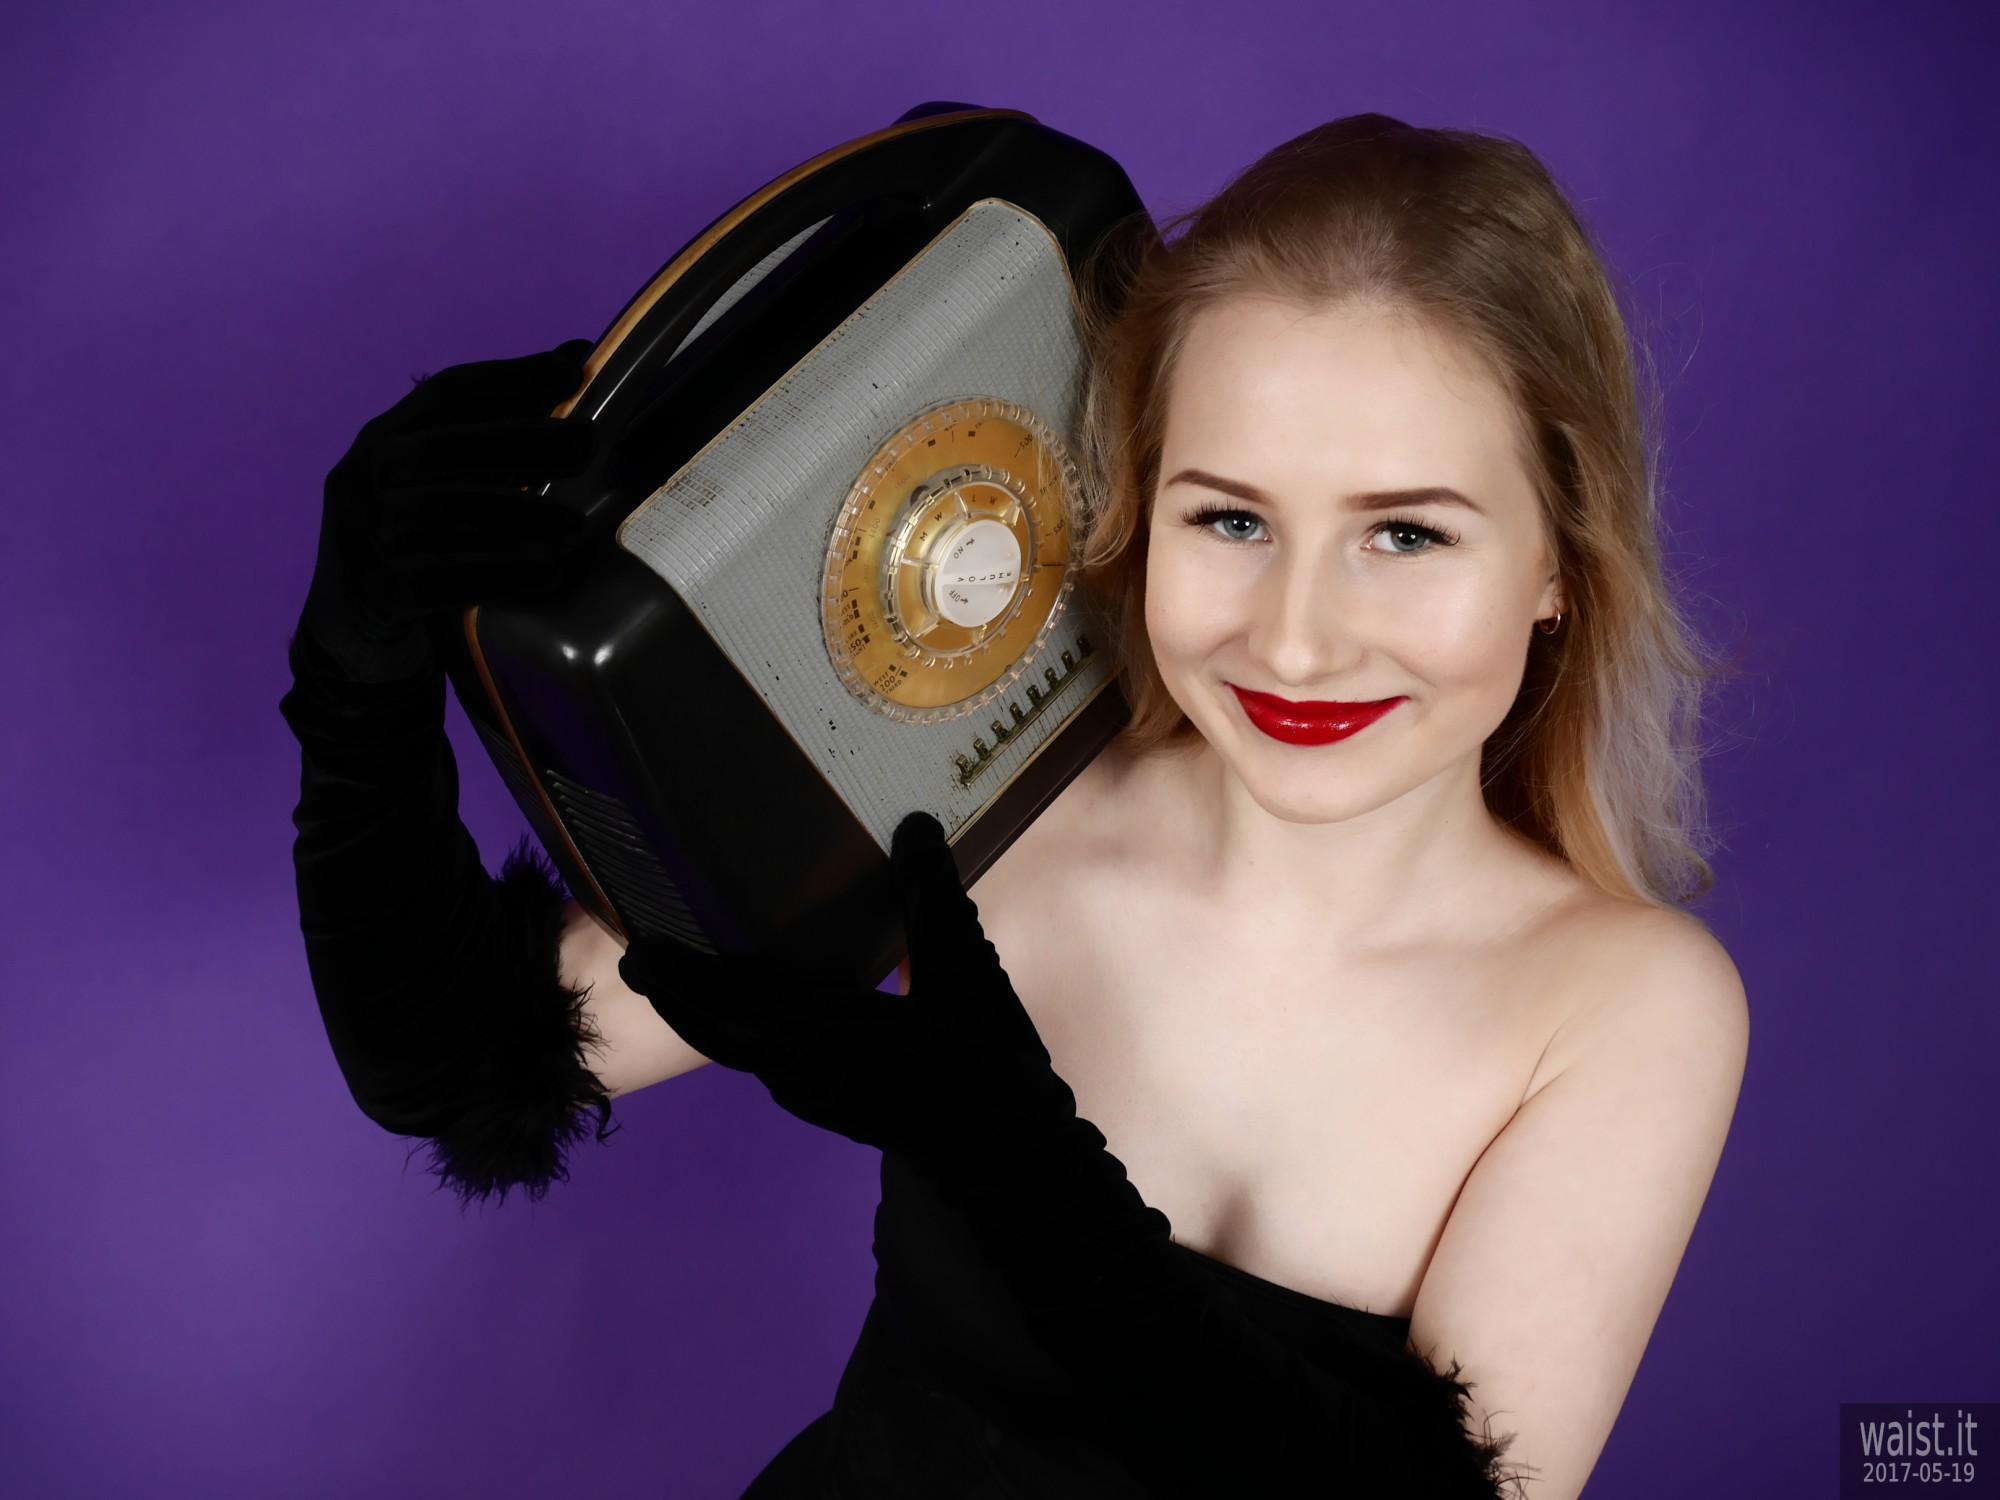 2017-05-19 Laura Sele in black sapewear with vintage Ferguson bakelite radio